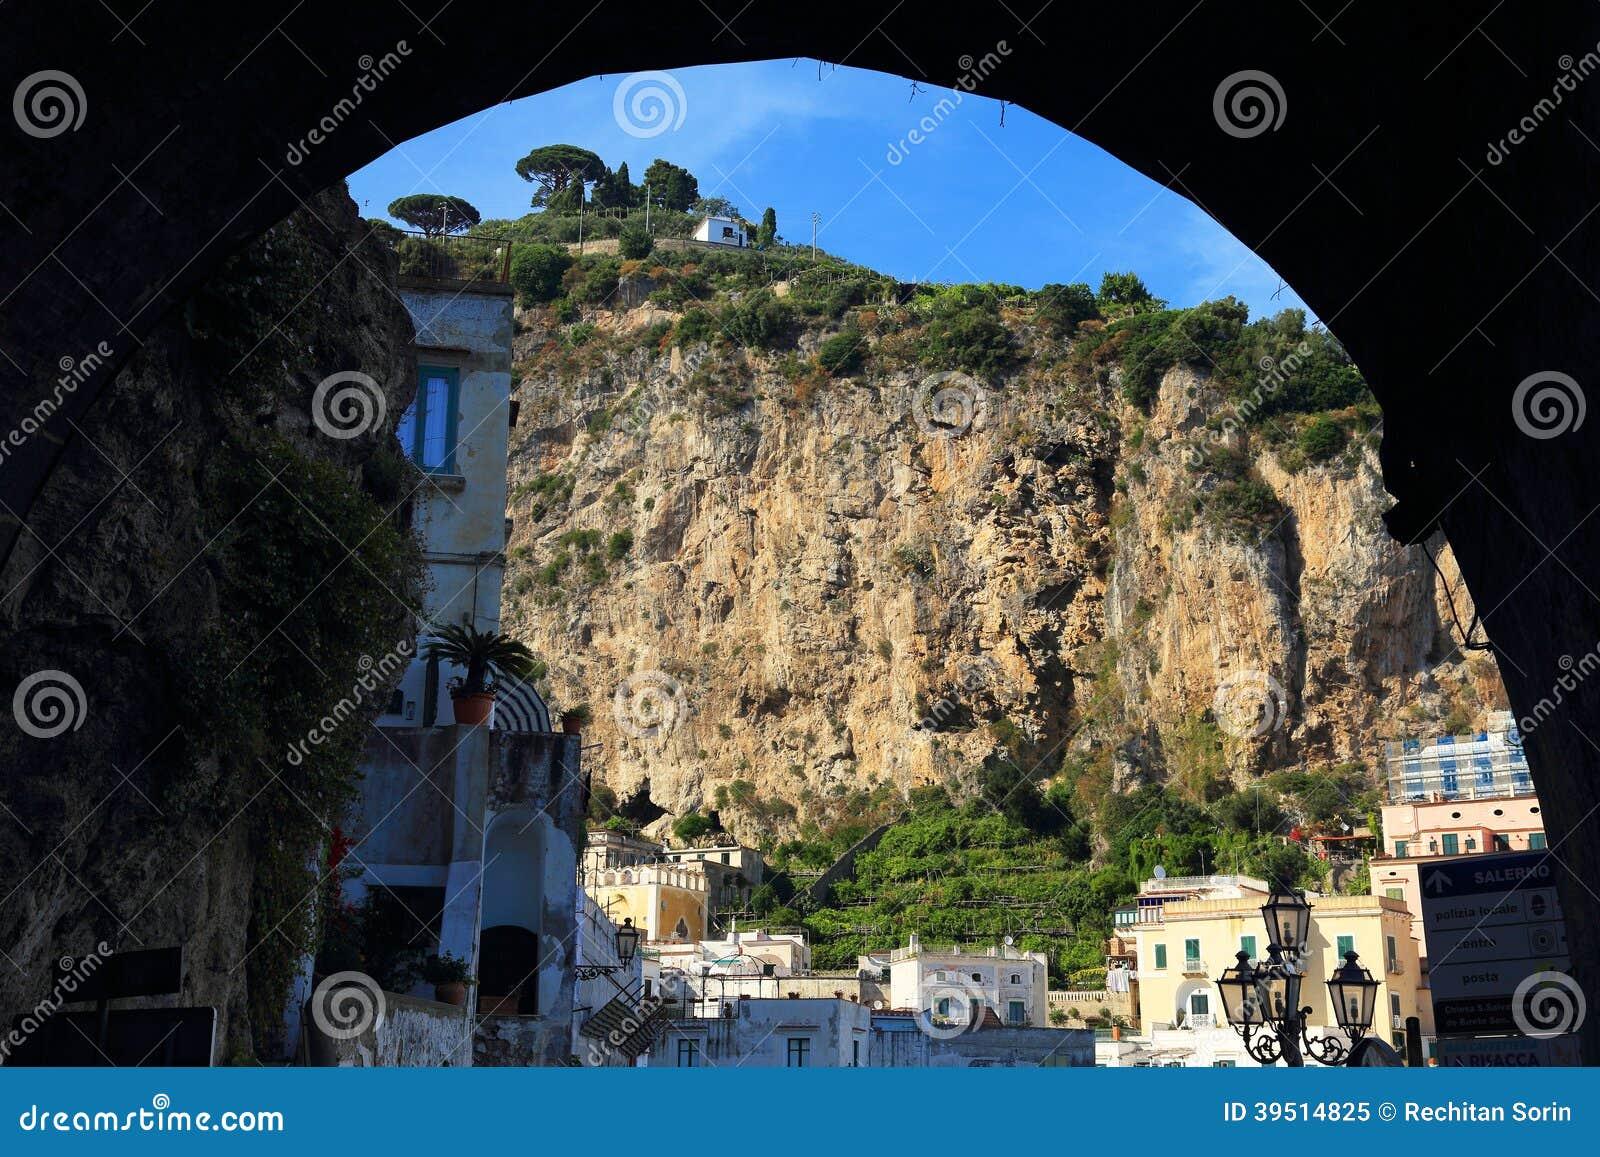 Atrani Resort, Italy, Europe